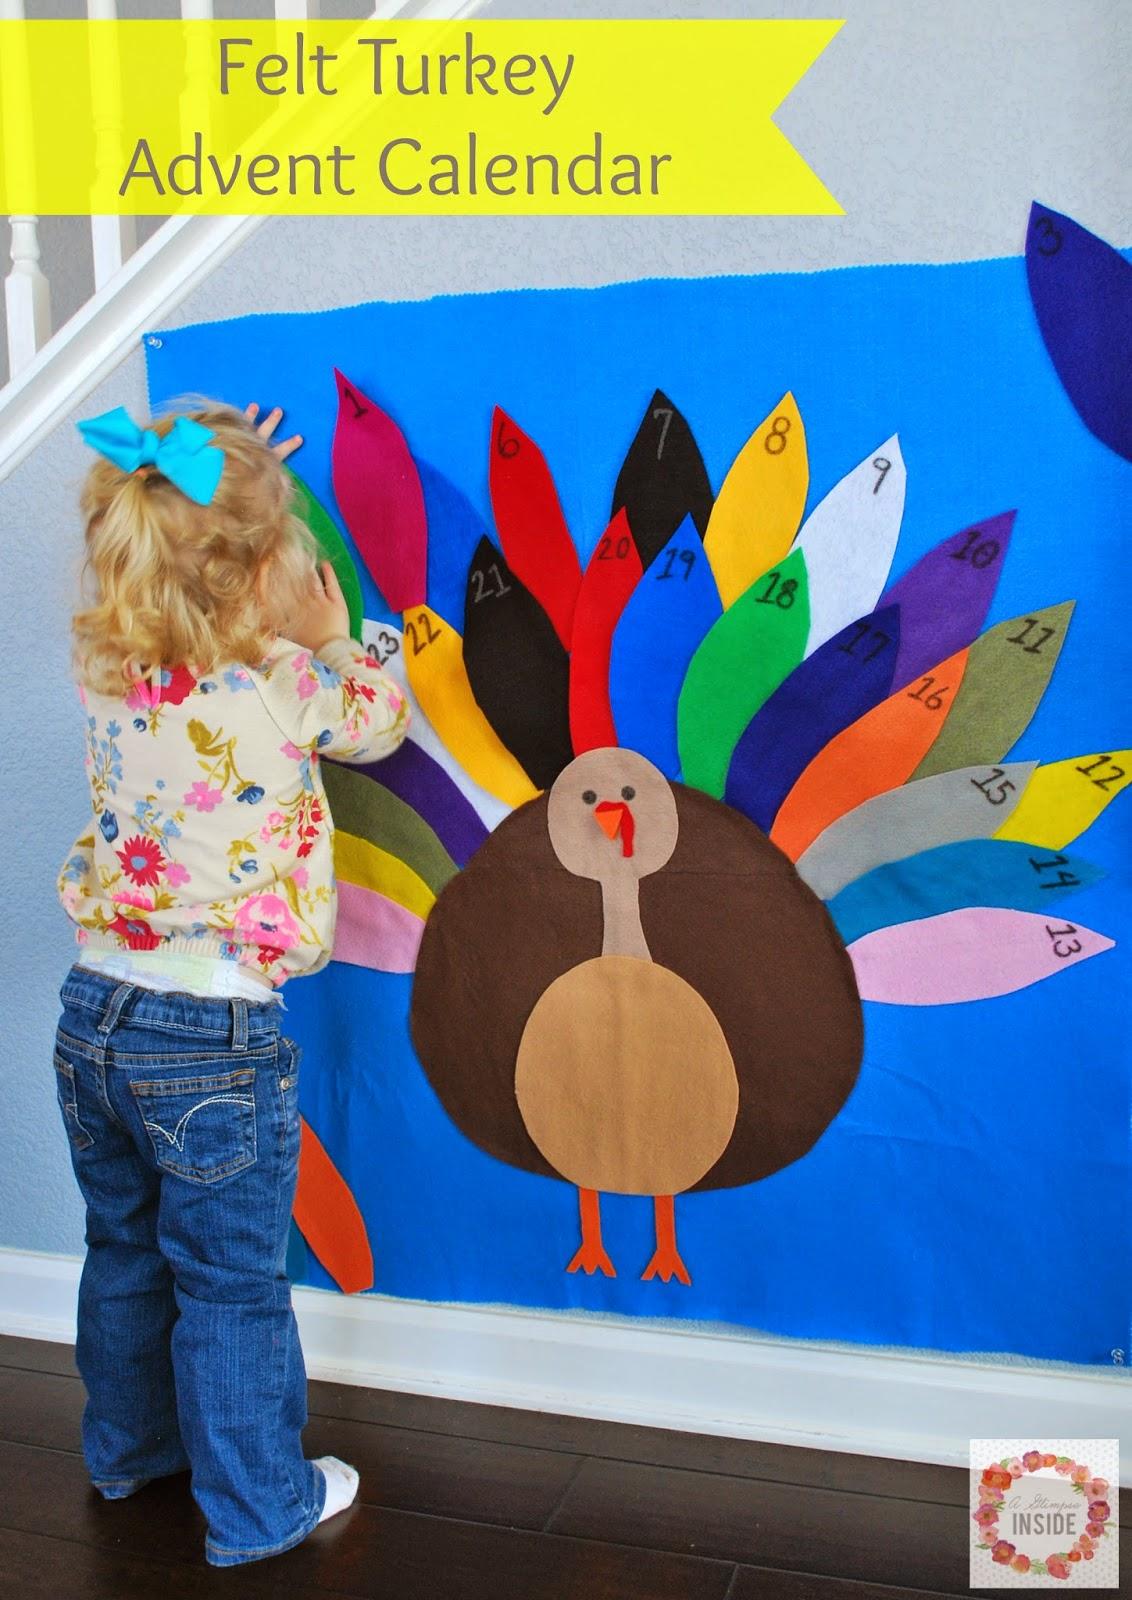 http://www.aglimpseinsideblog.com/2014/10/felt-turkey-advent-calendar.html